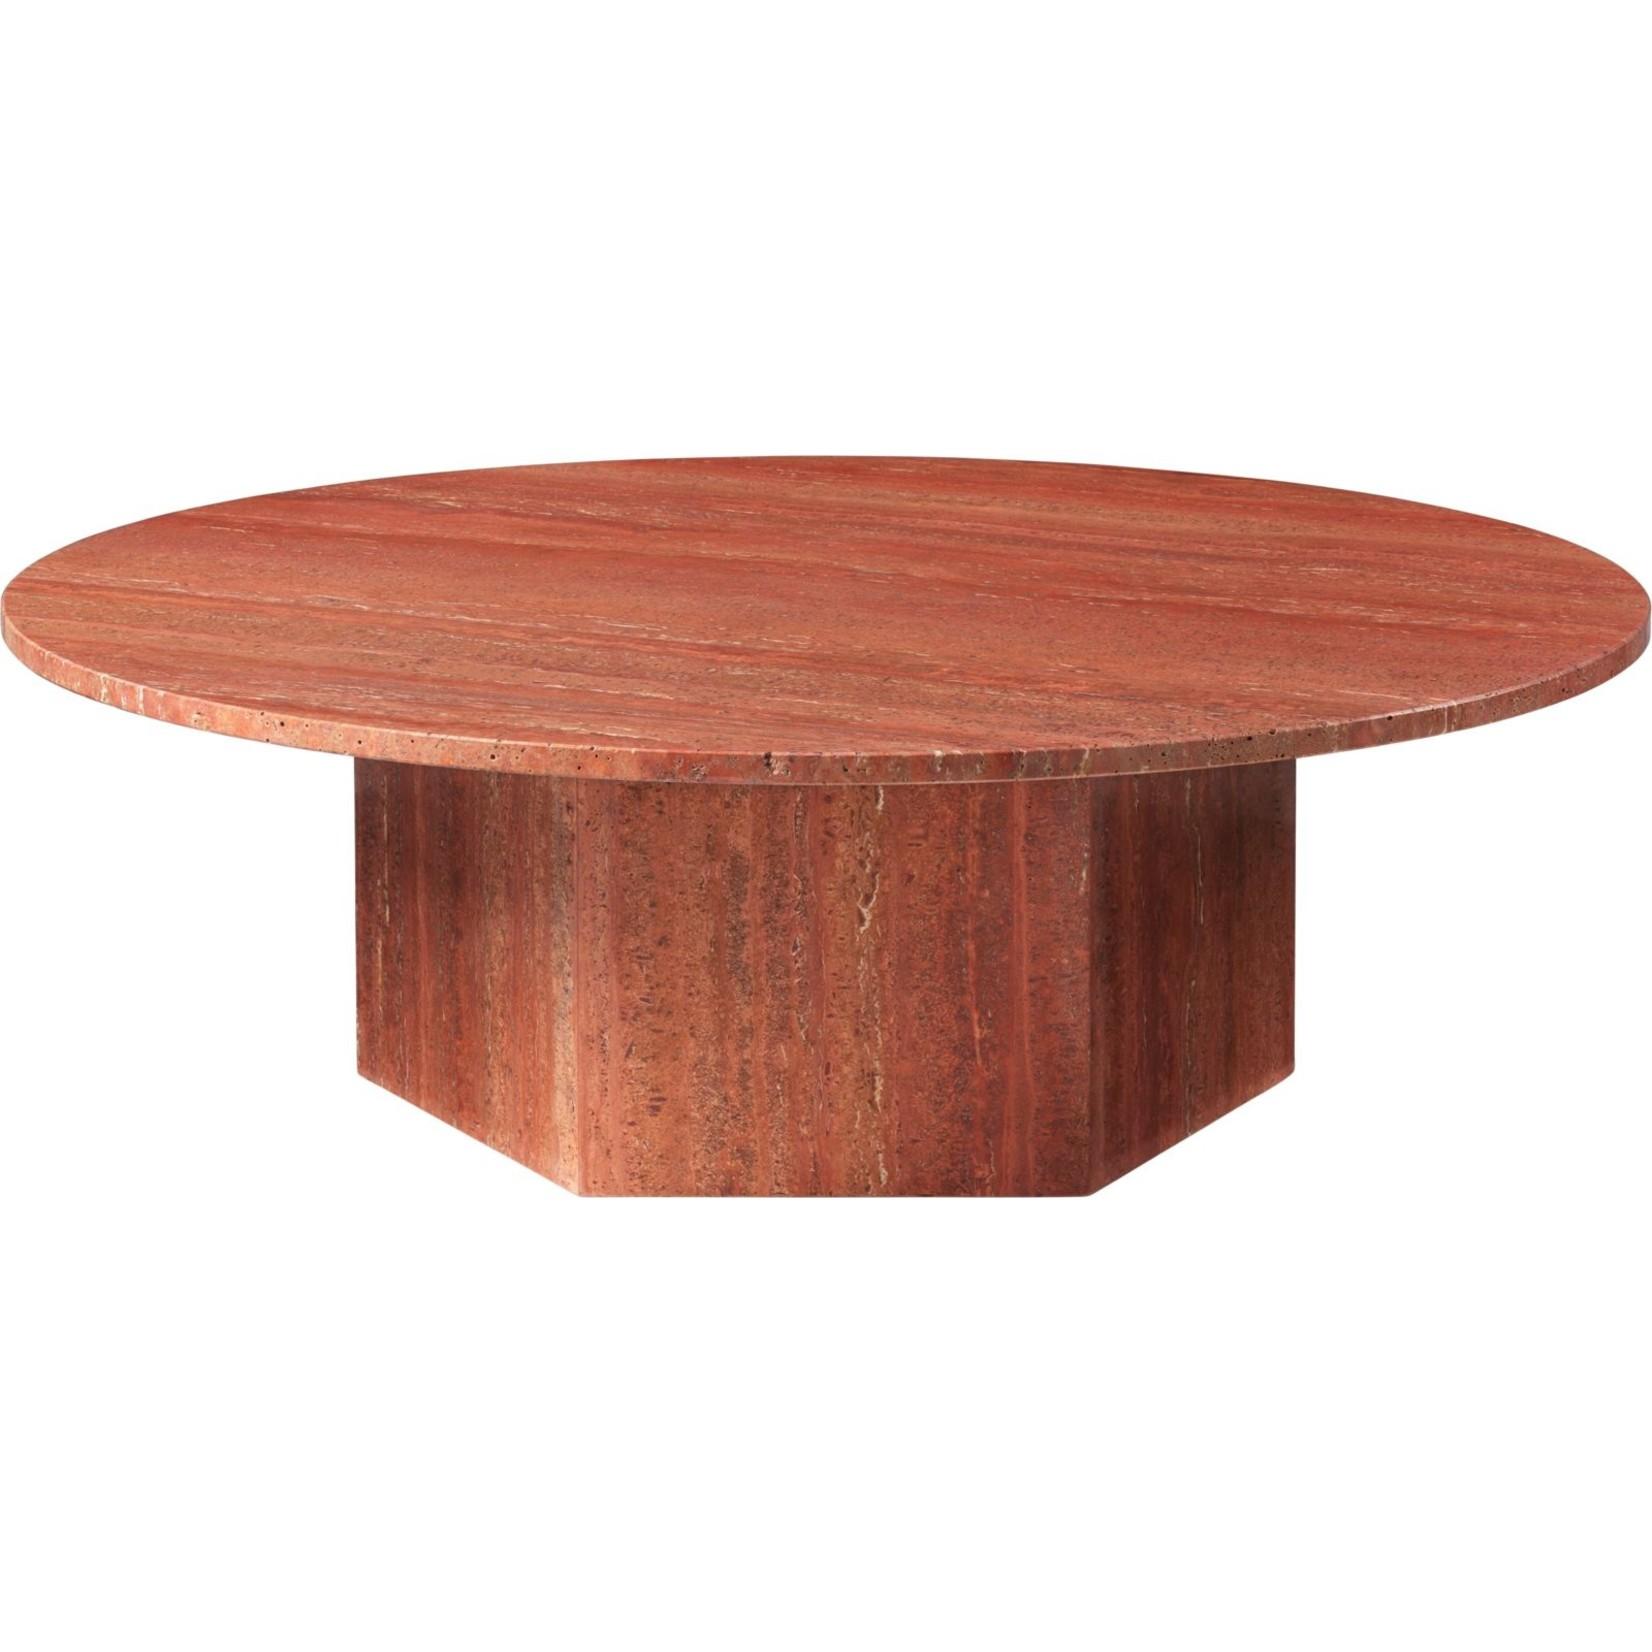 Gubi Table basse Epic ronde Ø110 | Travertin rouge